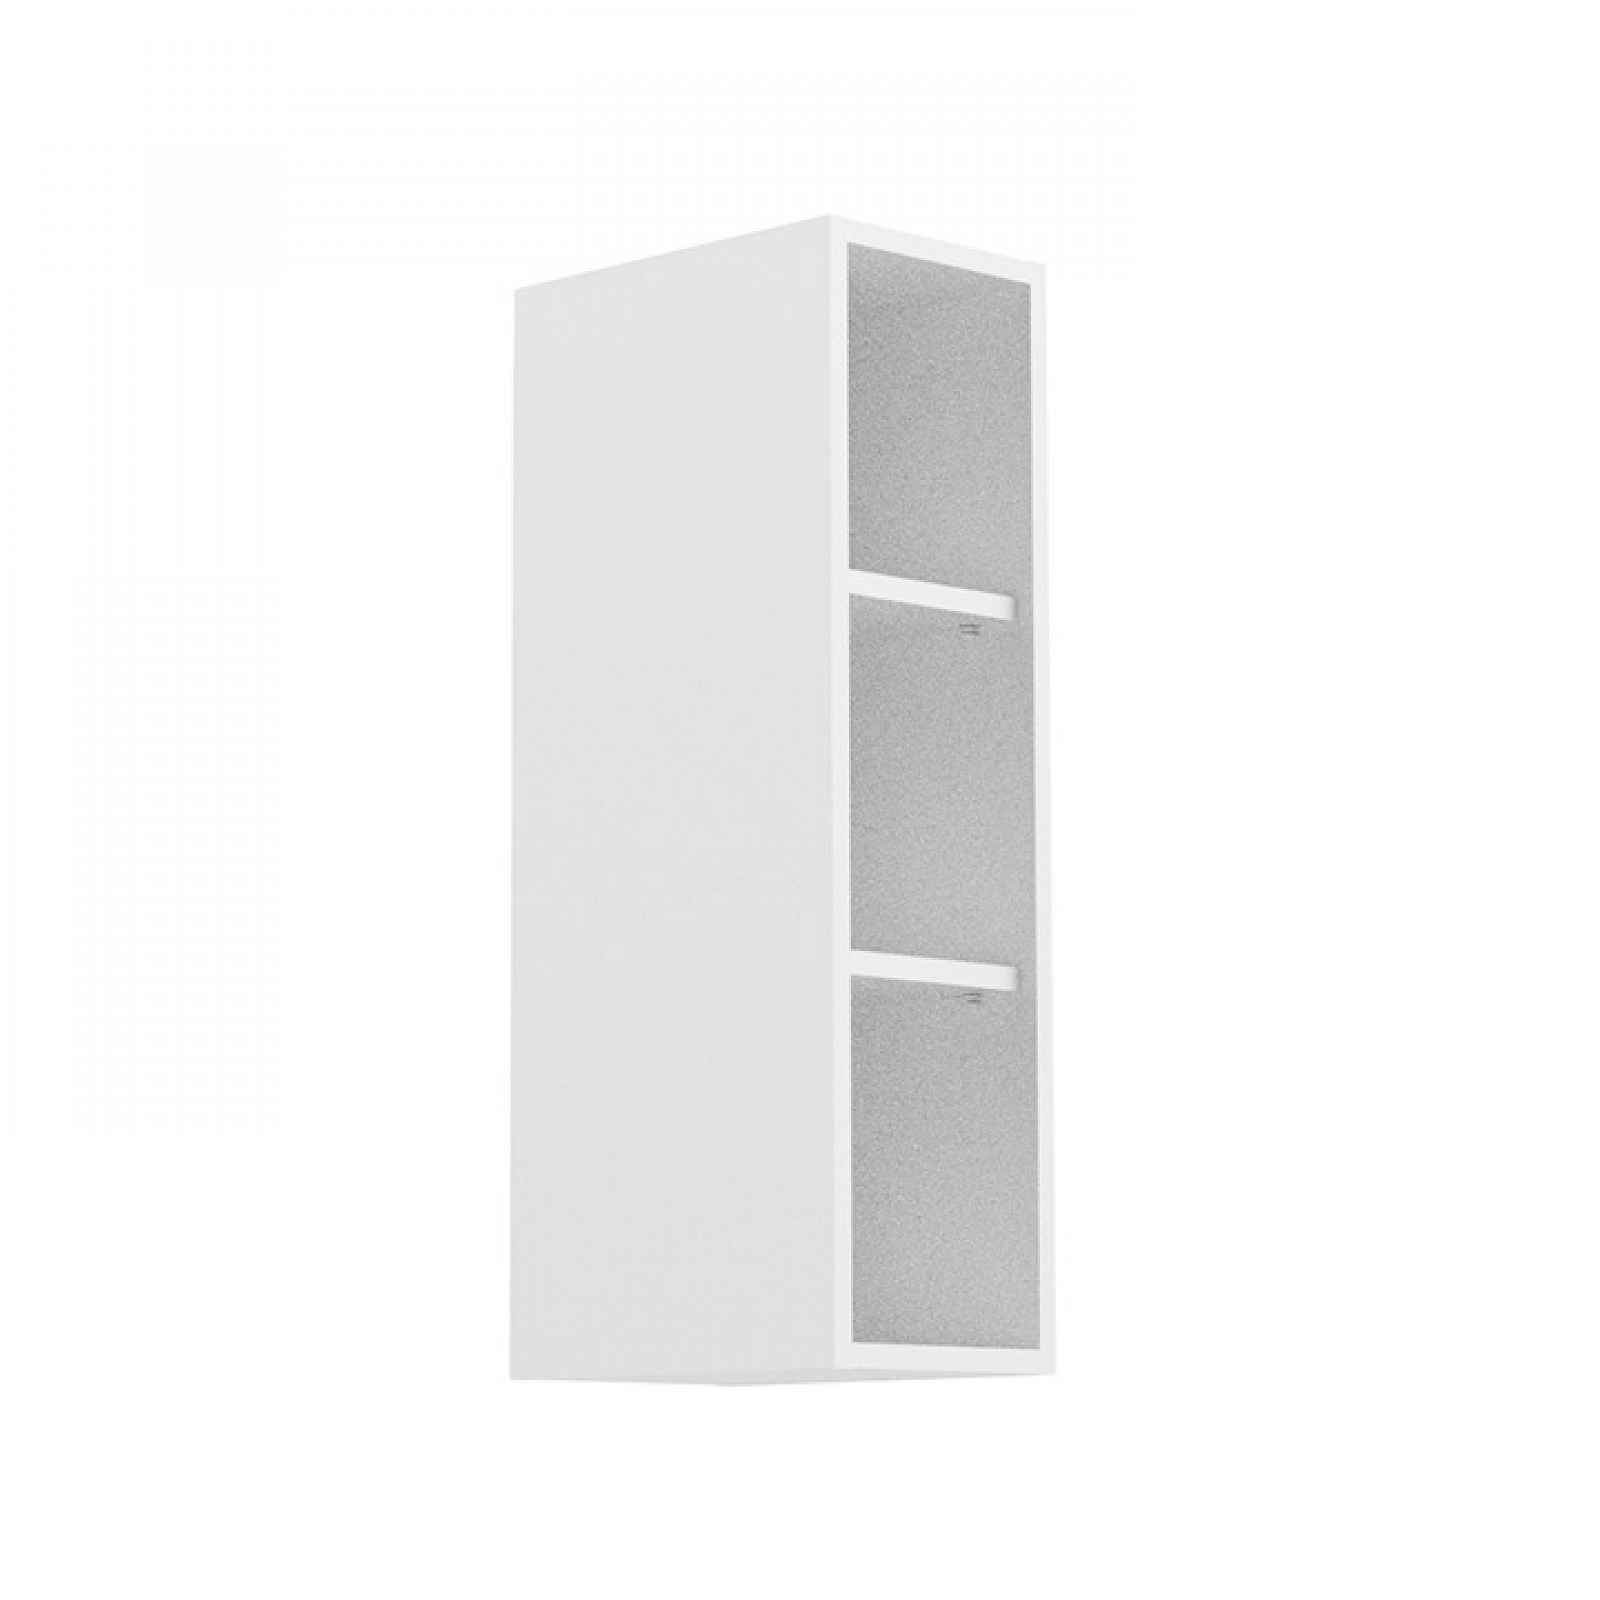 Horní skříňka, bílá, AURORA W200 0000236717 Tempo Kondela